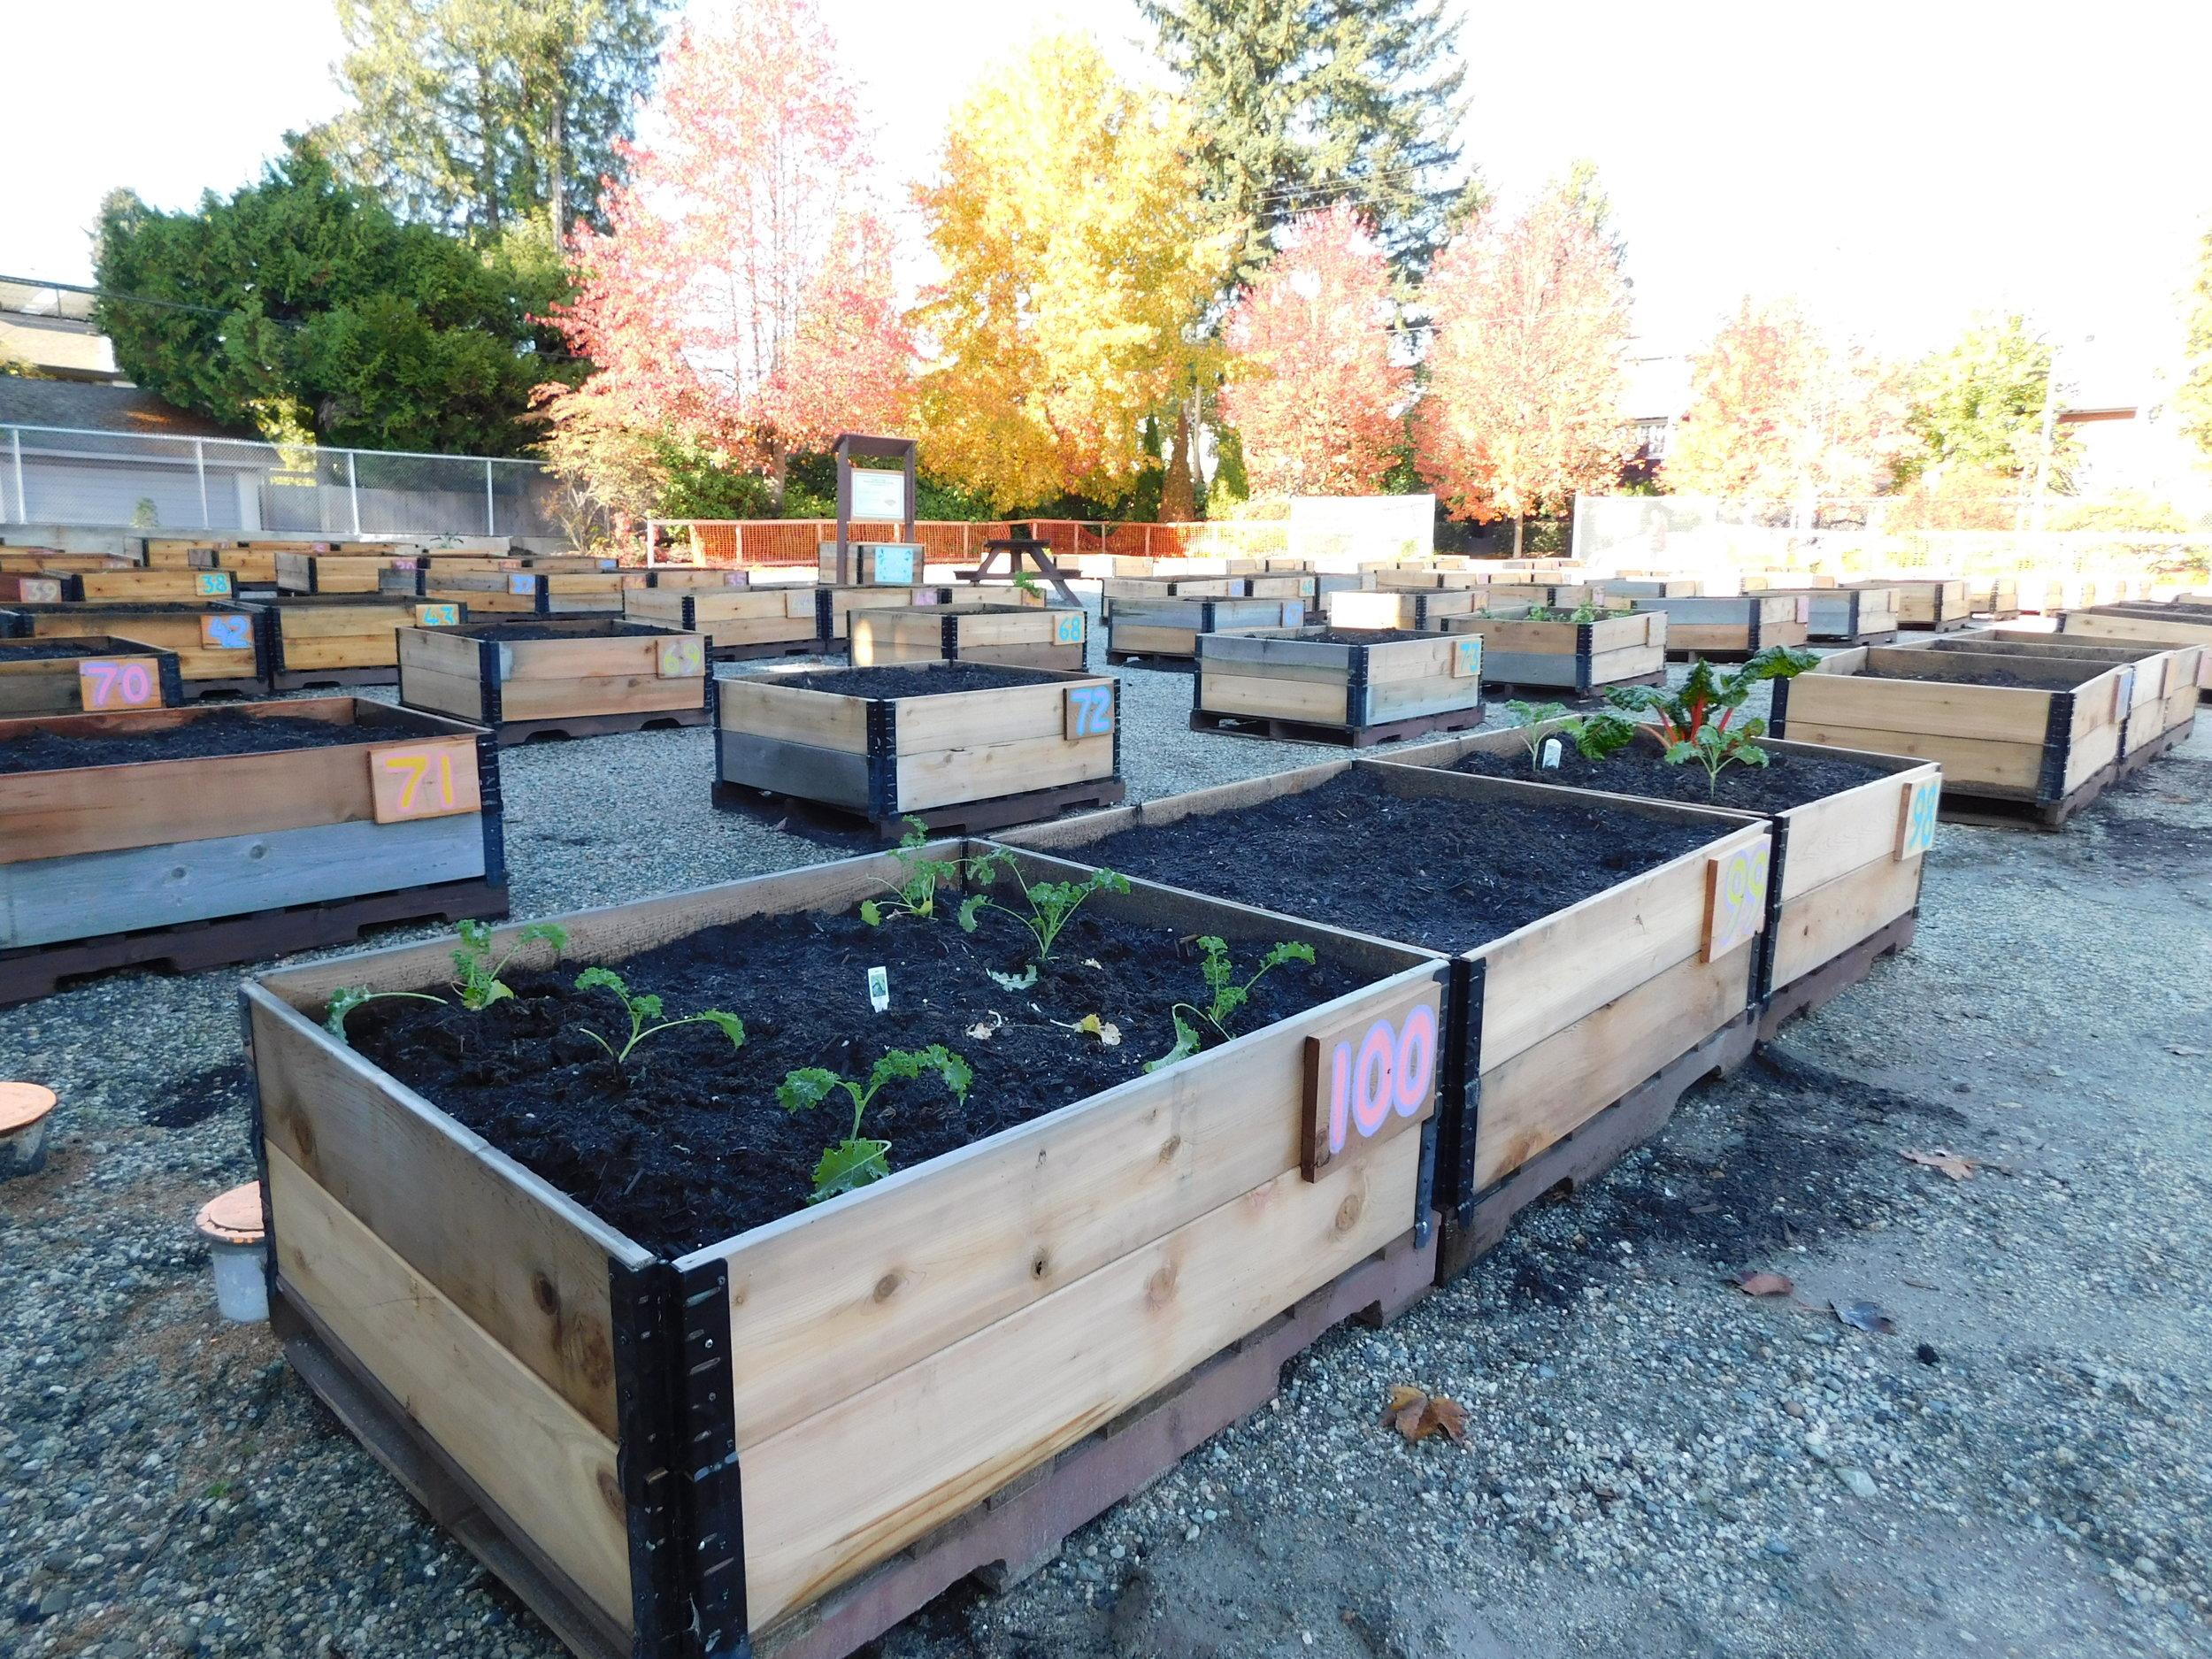 Dunbar_40th_Vancouver_Community_Garden_Builders-0008.JPG